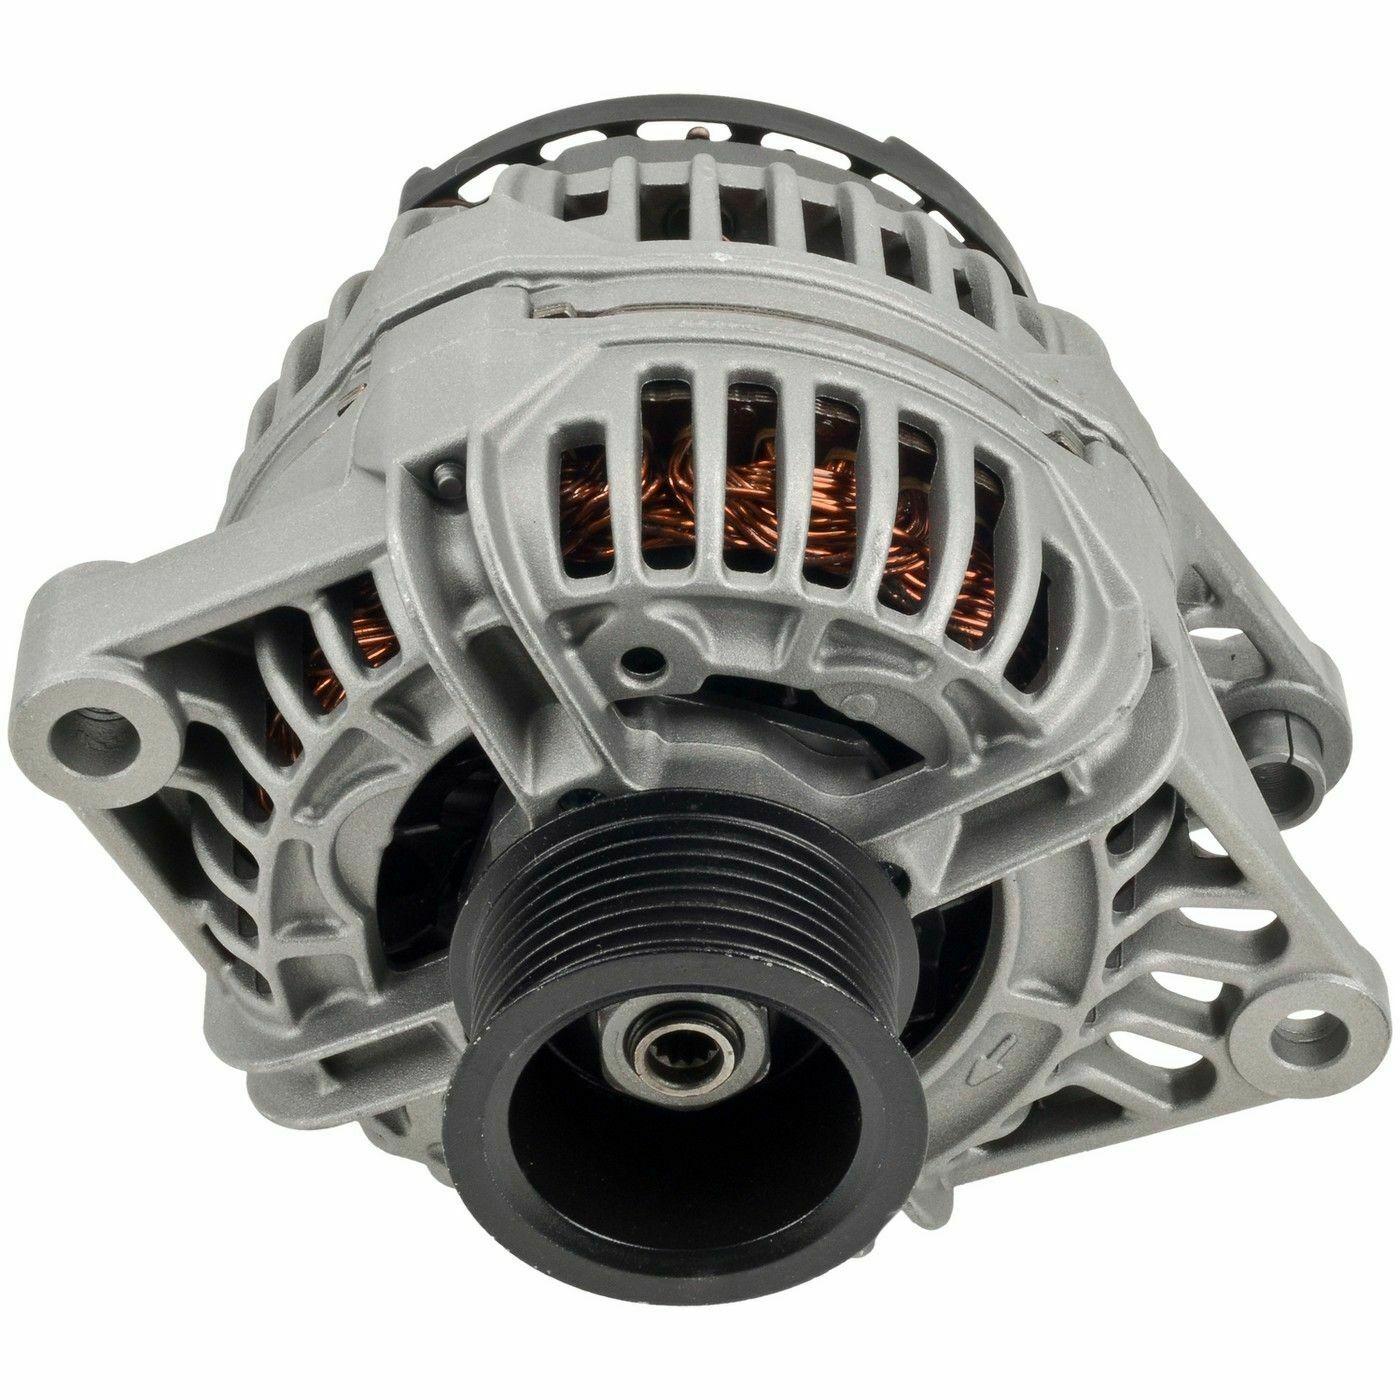 Bosch Reman Alternator for 98.5-02 5.9L Cummins ISB